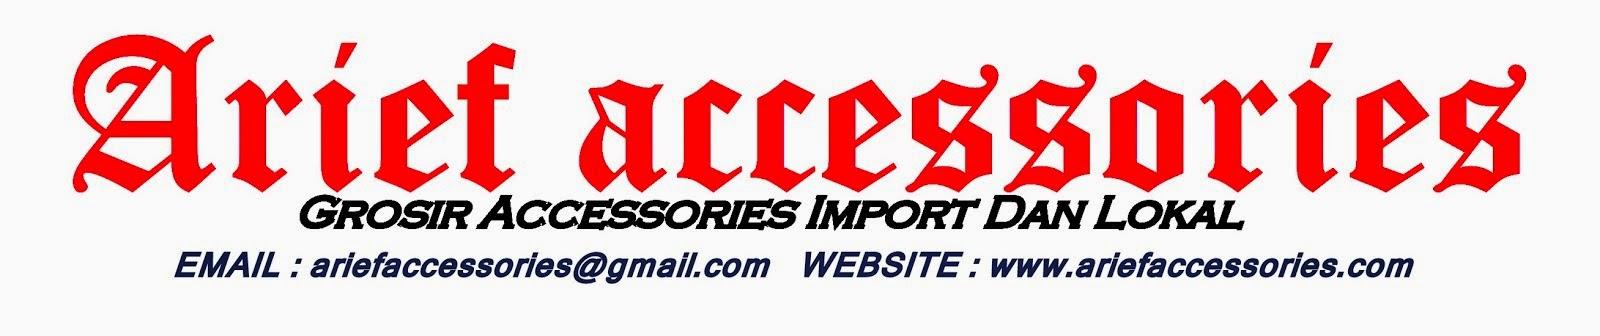 ARIEF ACCESSORIES